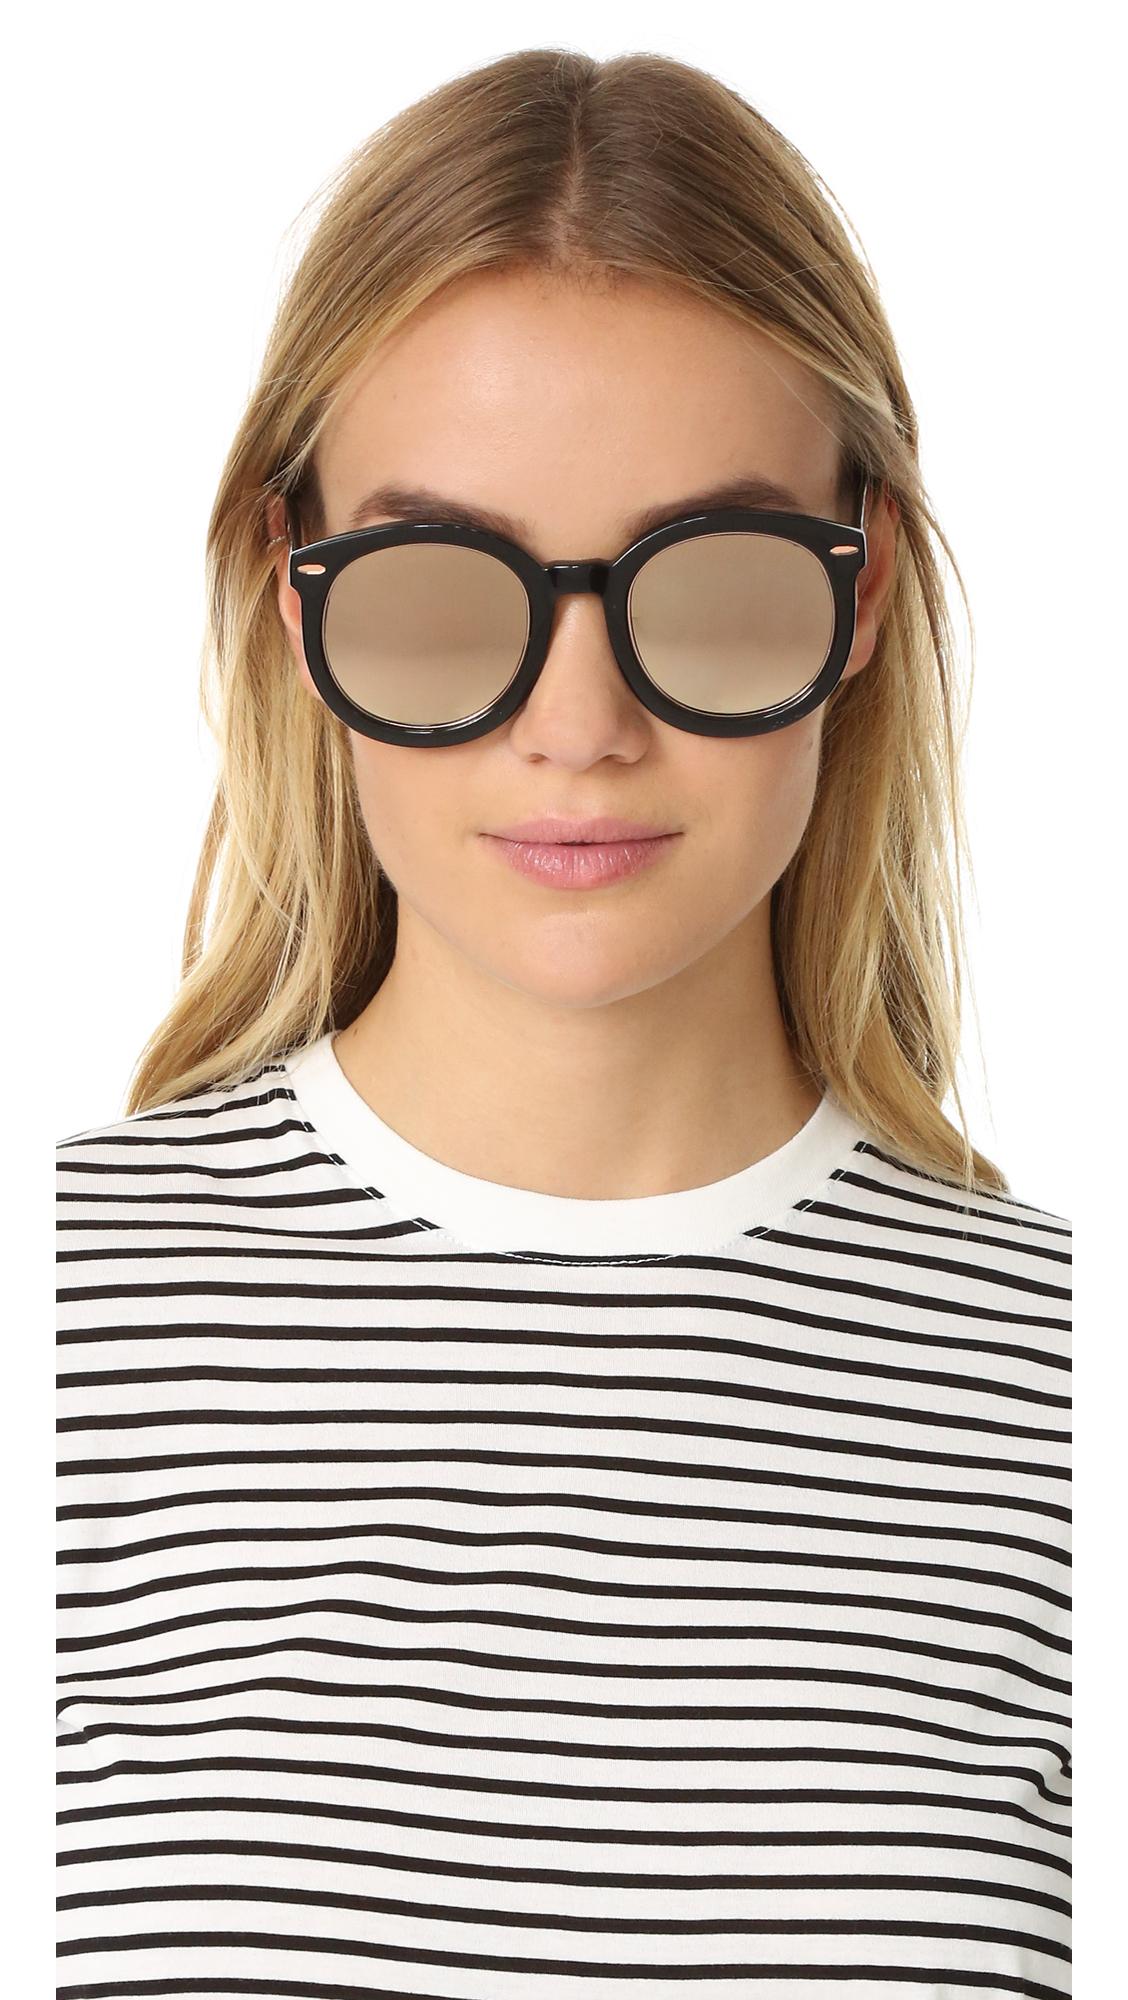 c134d0fcaec Karen Walker Super Duper Superstar Sunglasses